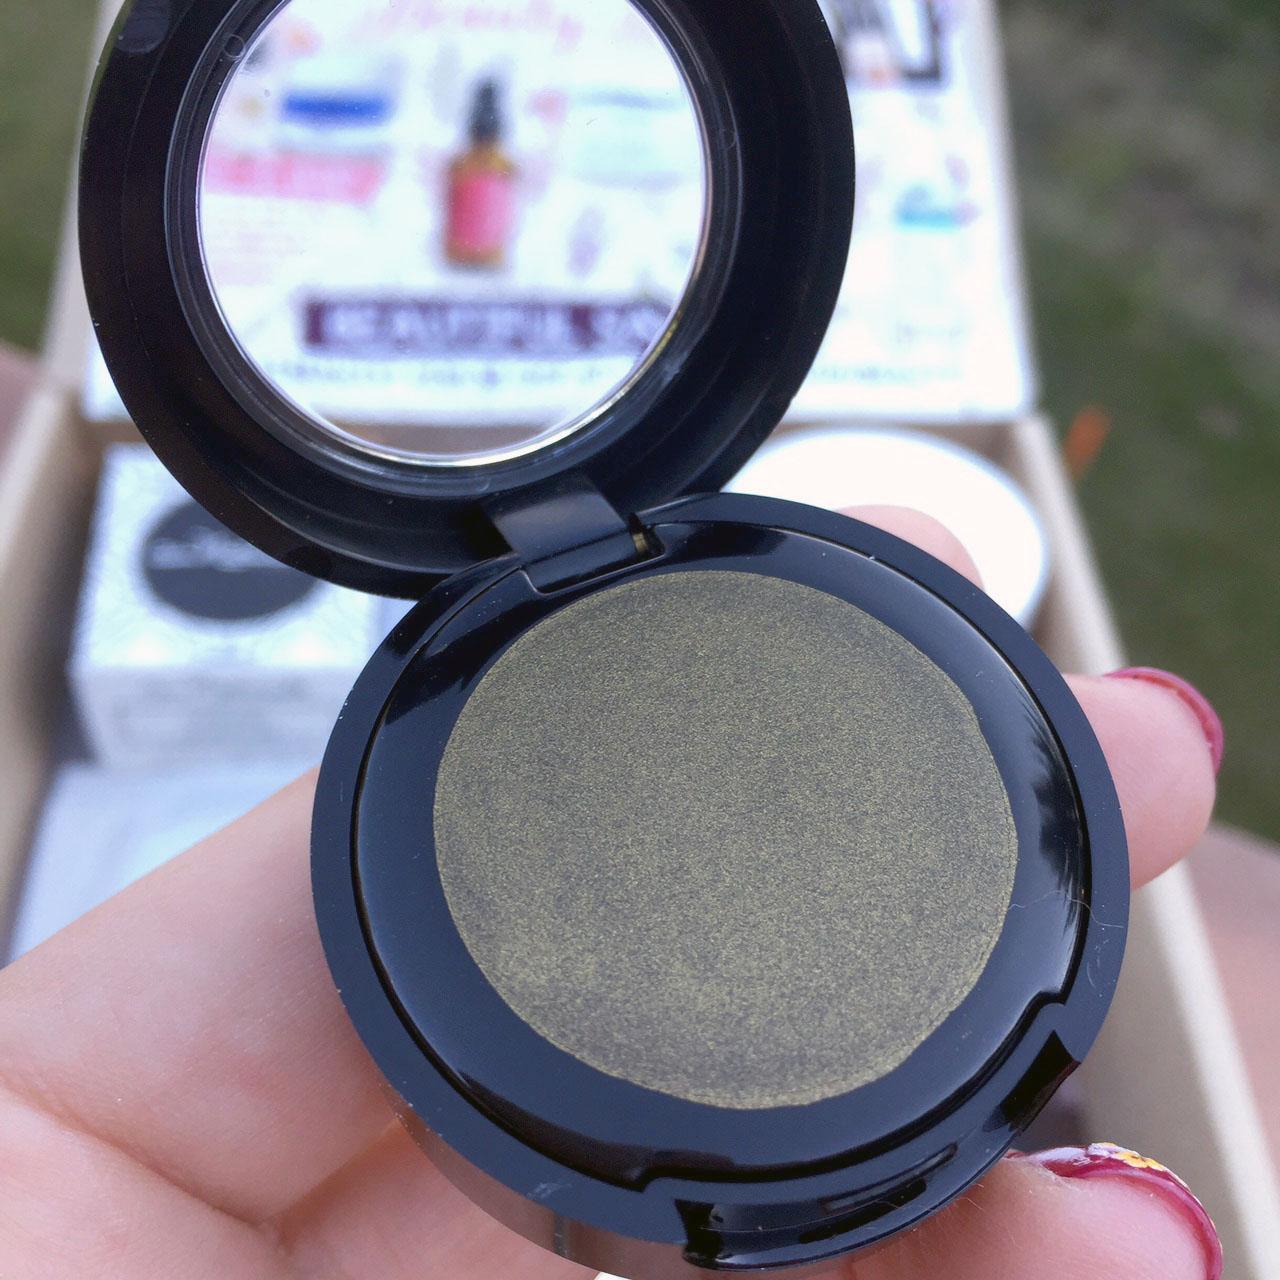 Au Naturale Organic Creme Eyeshadow in Addiction